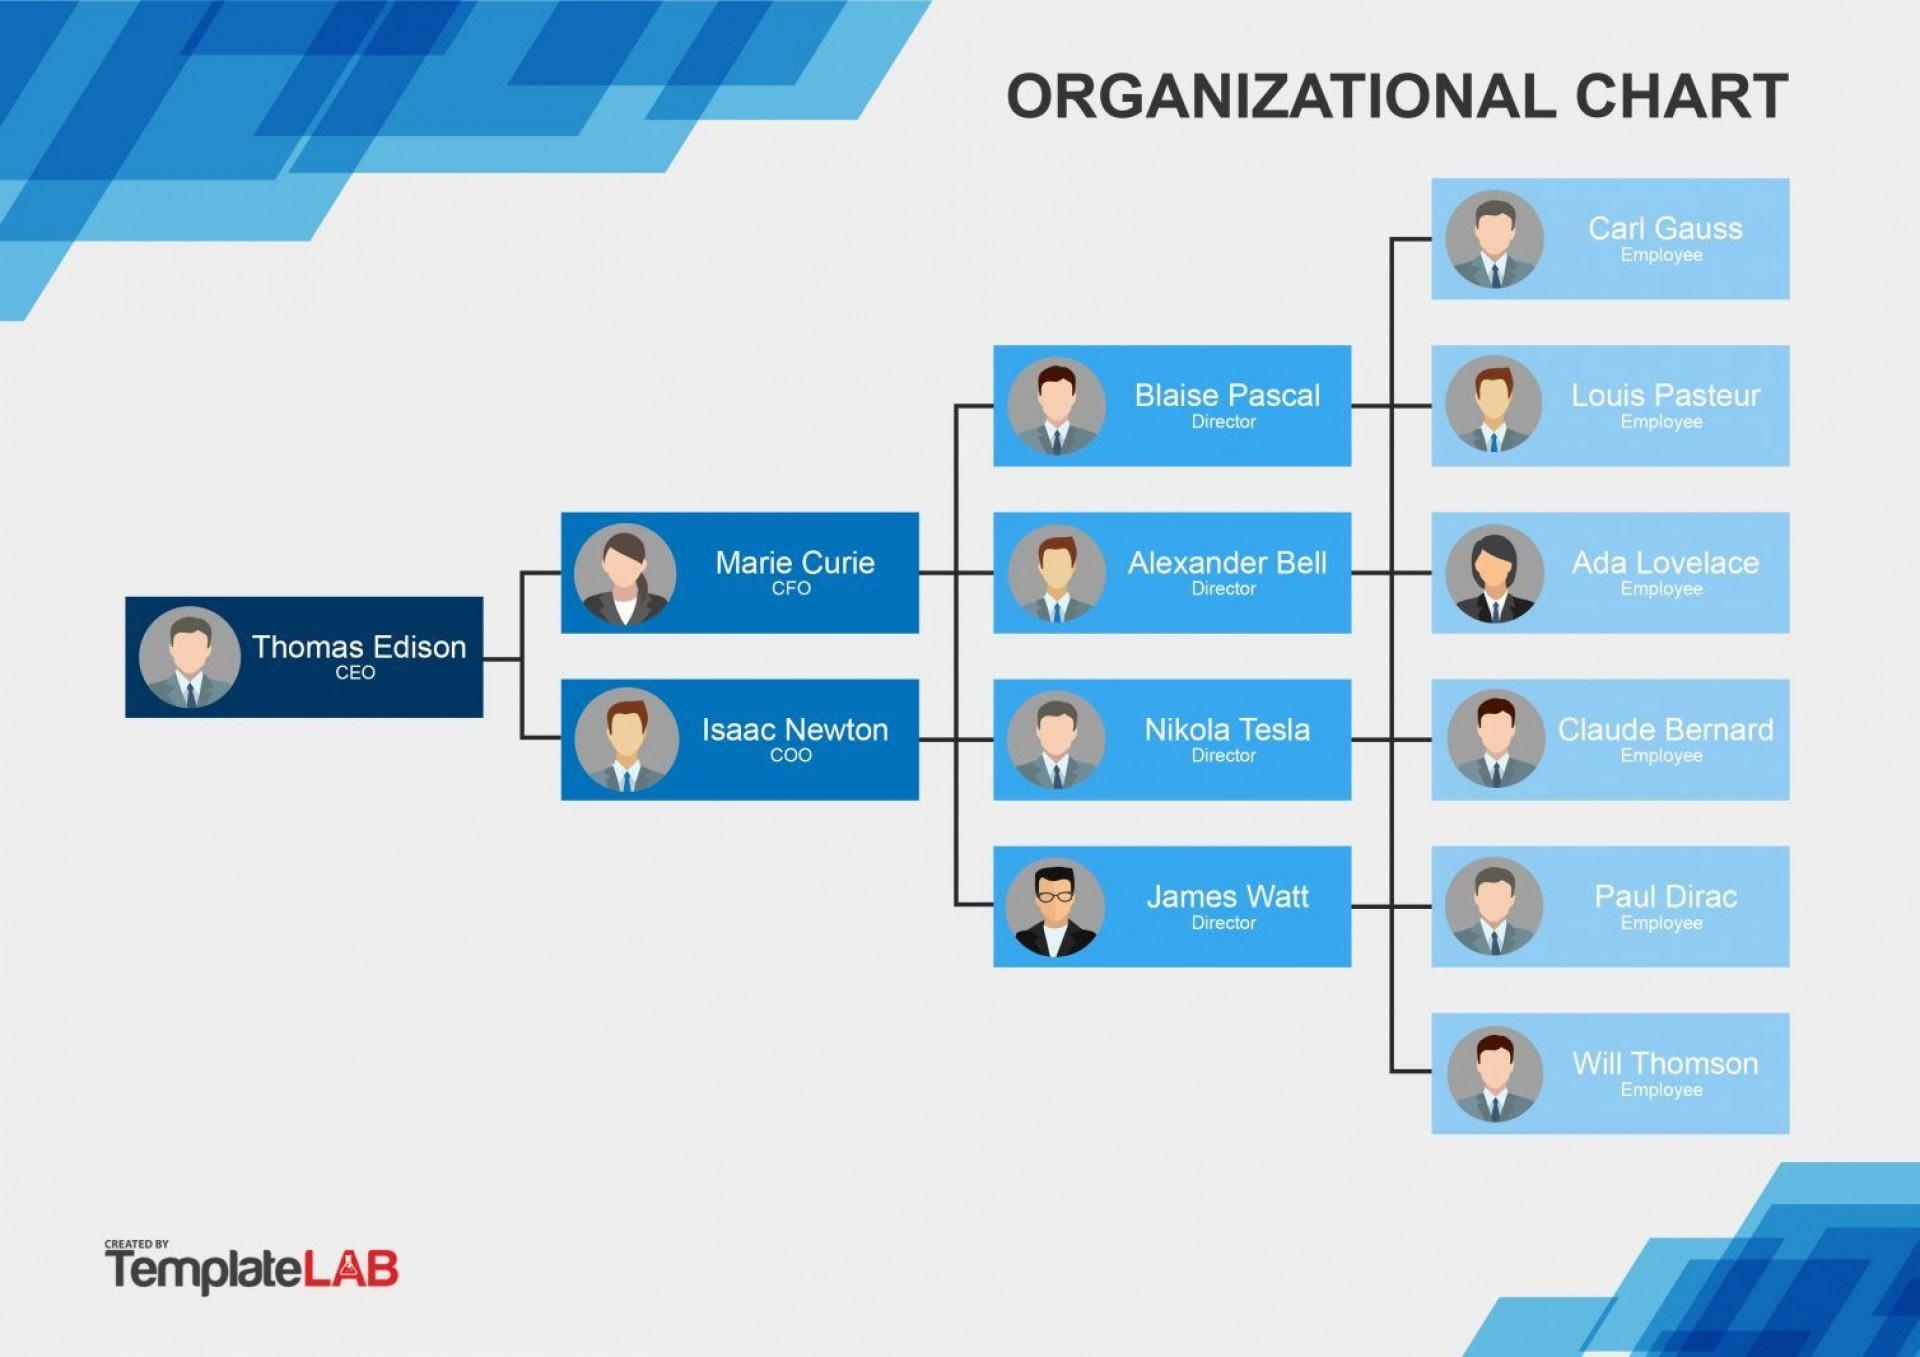 008 Wonderful Microsoft Office Organizational Chart Template Idea  Templates Flow Excel1920